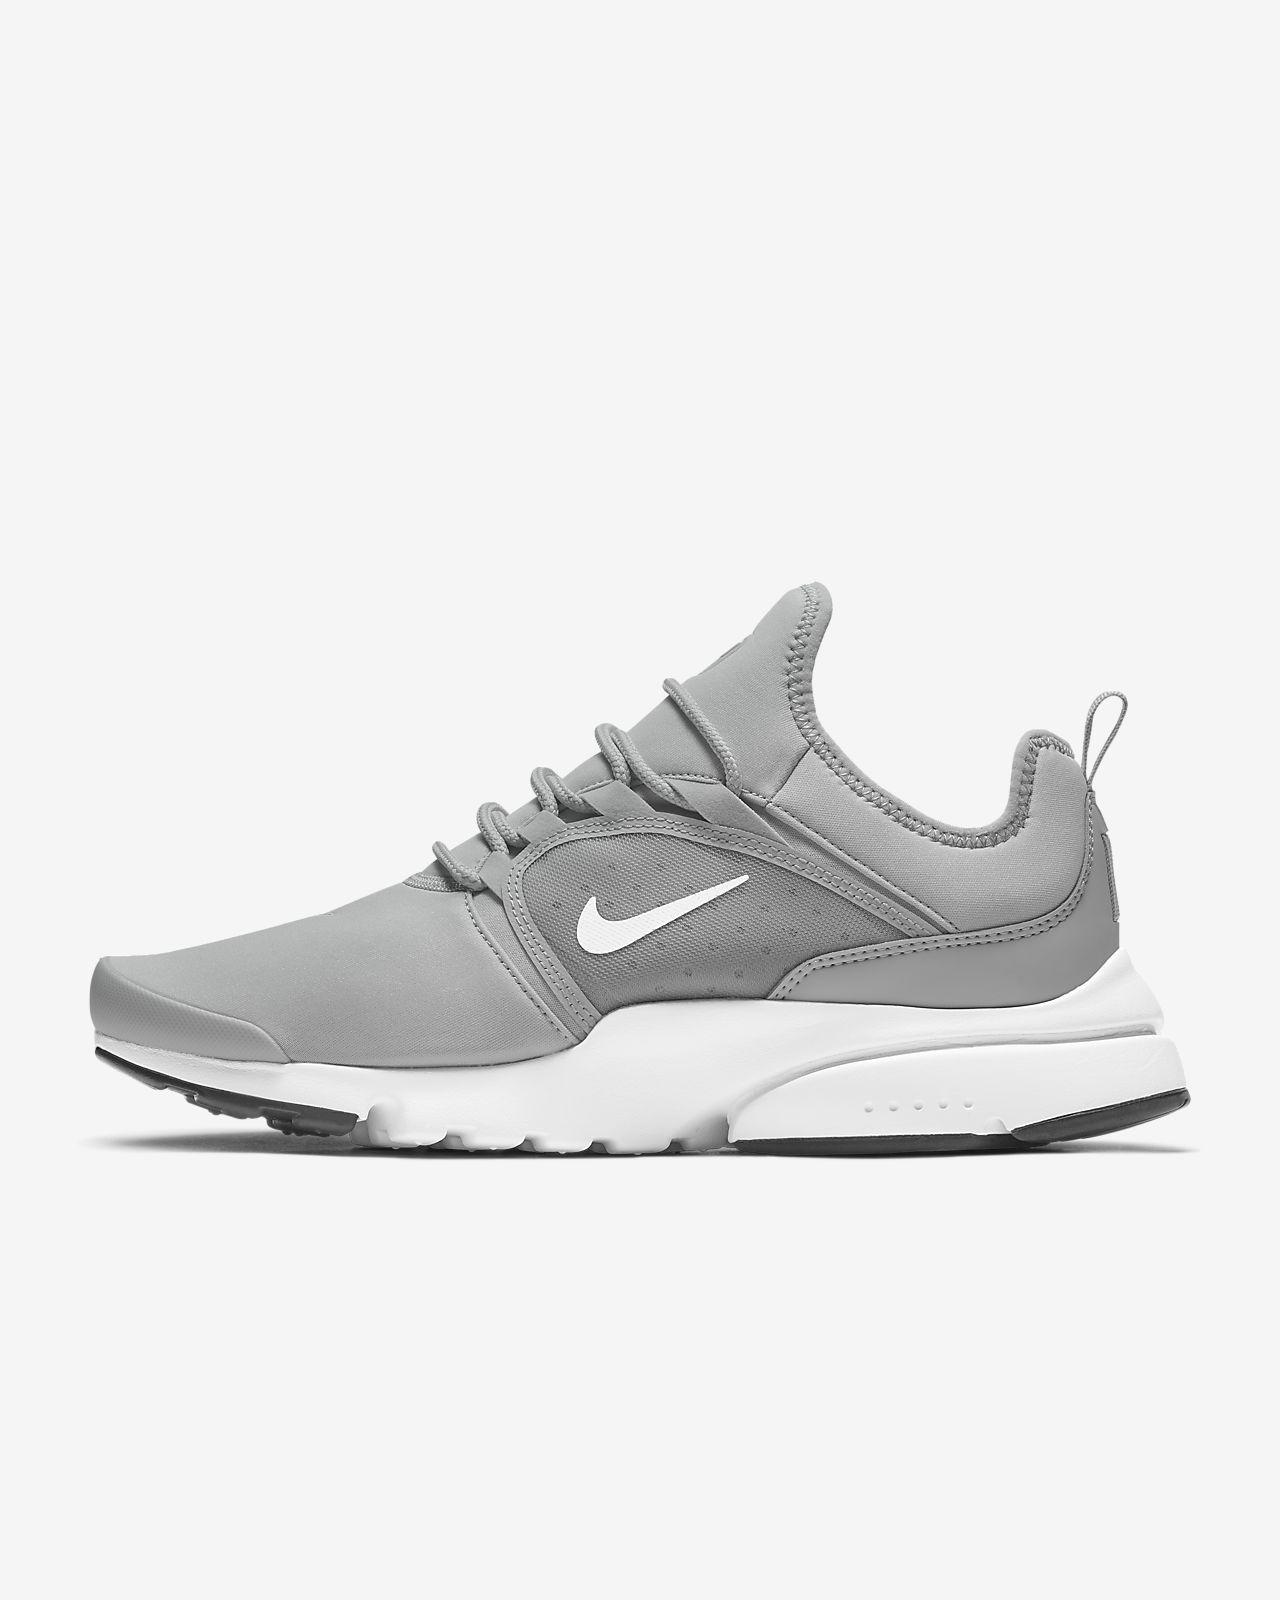 84e07c5d58a7 Pánská bota Nike Presto Fly World. Nike.com CZ